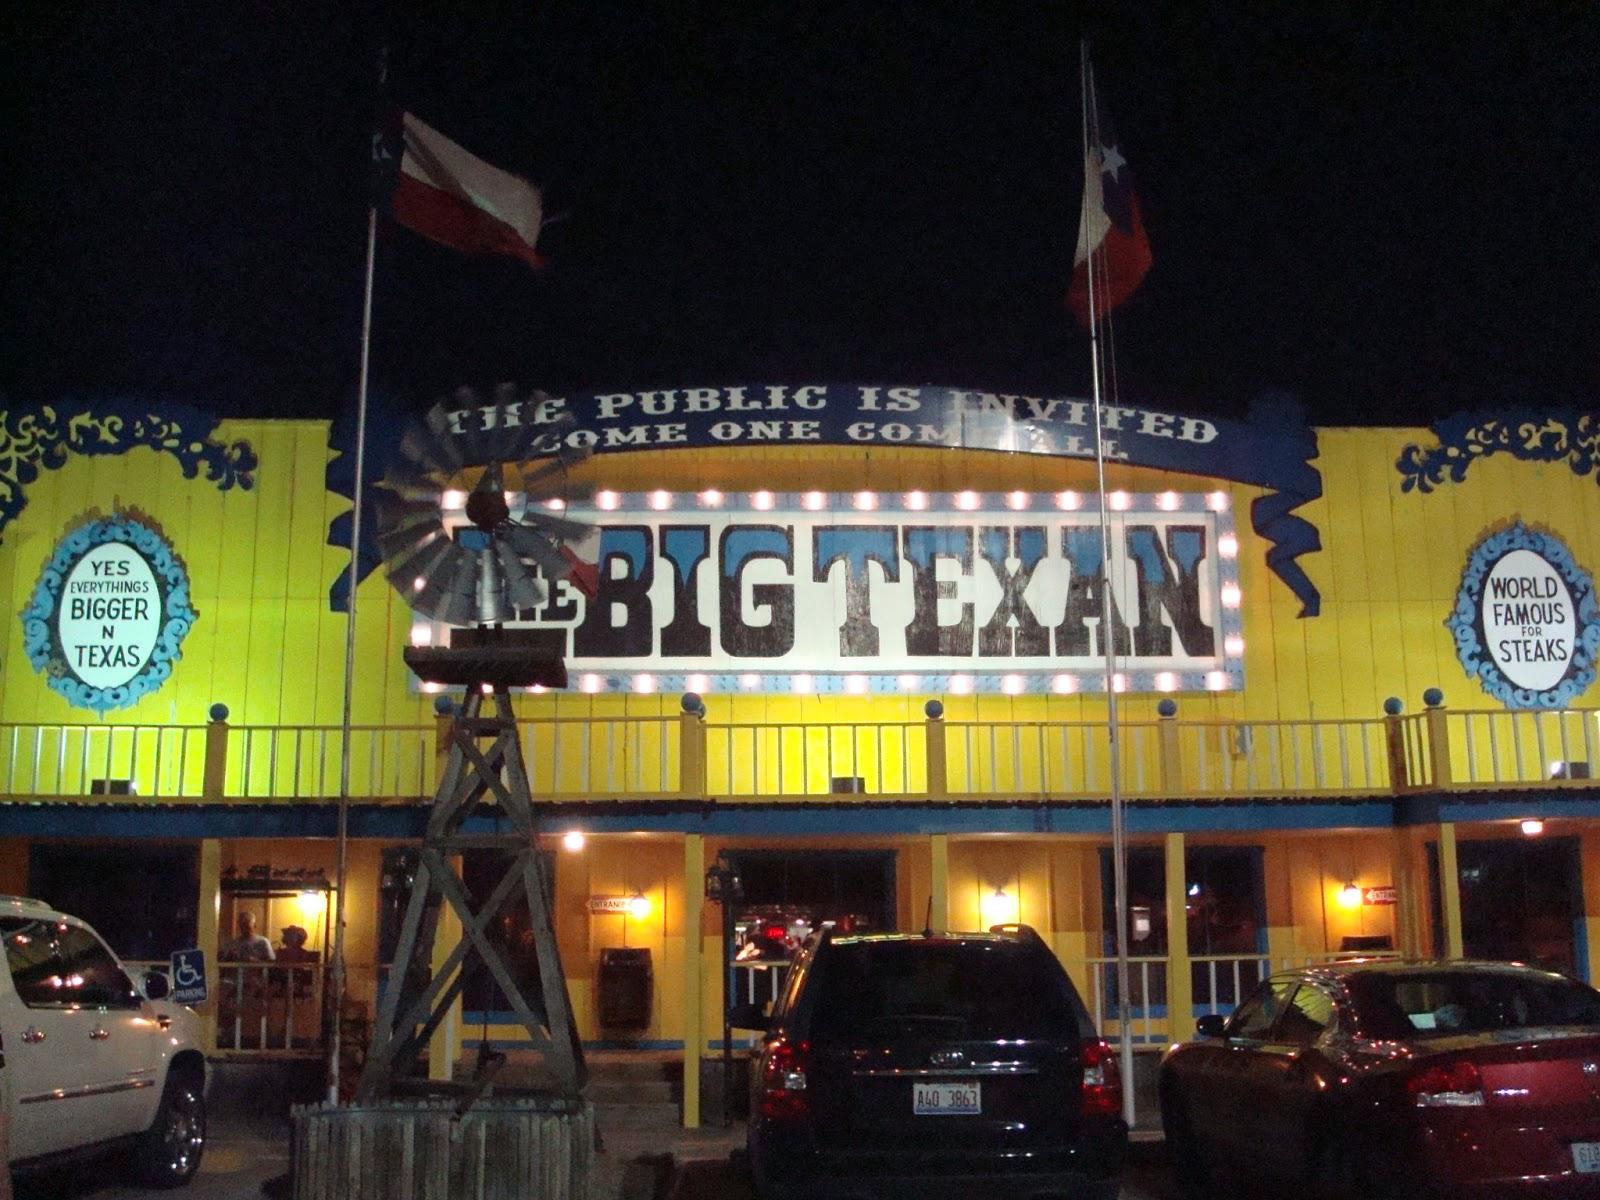 Restaurante Big Texan